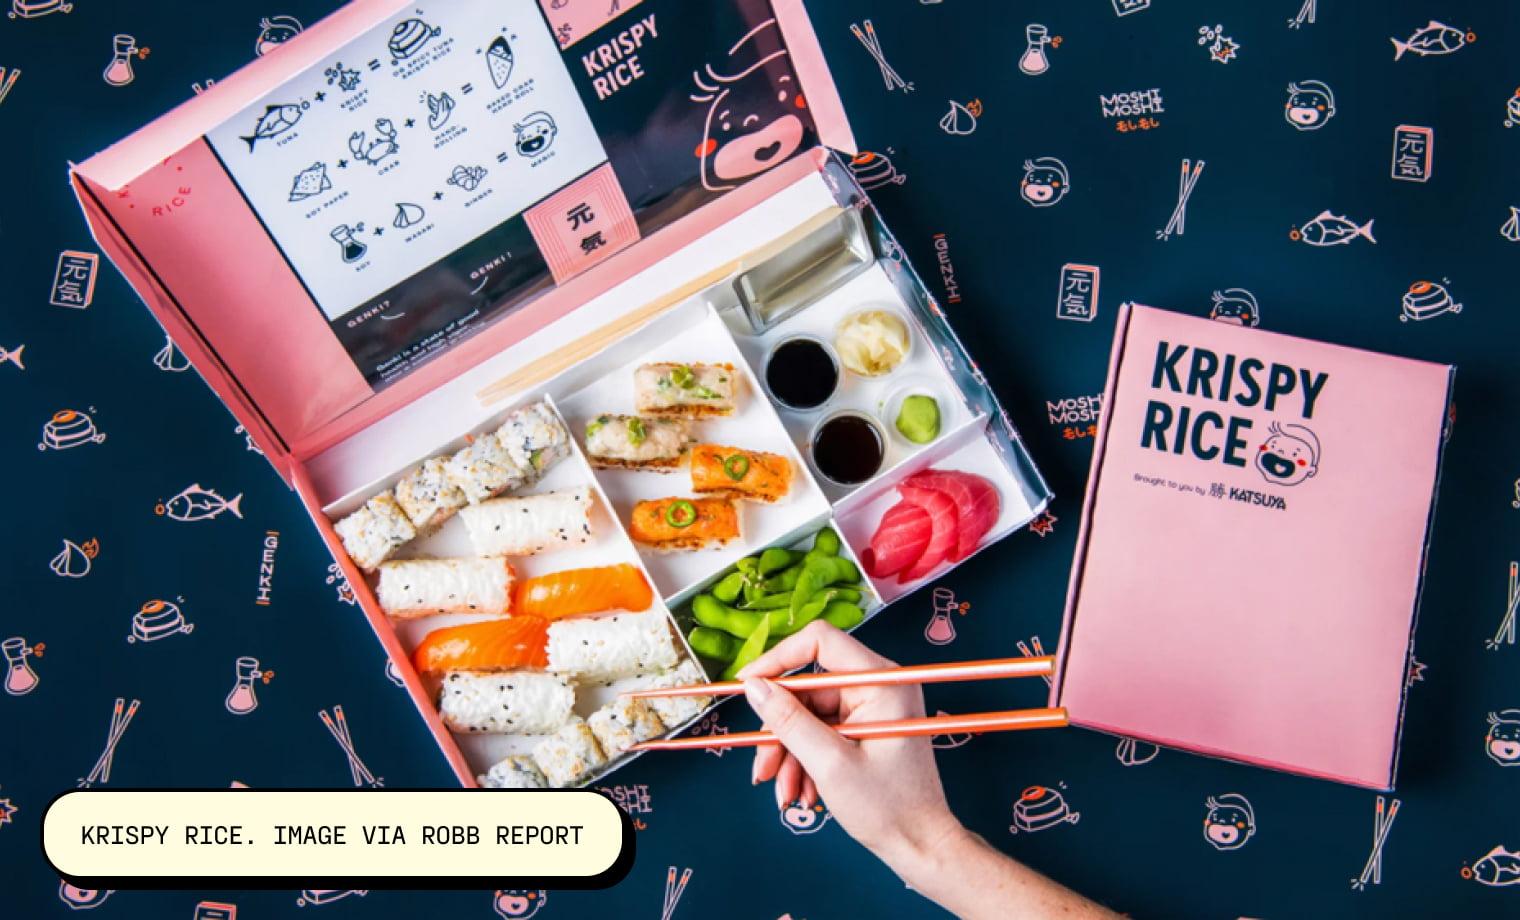 Krispy Rice. Image via Robb Report